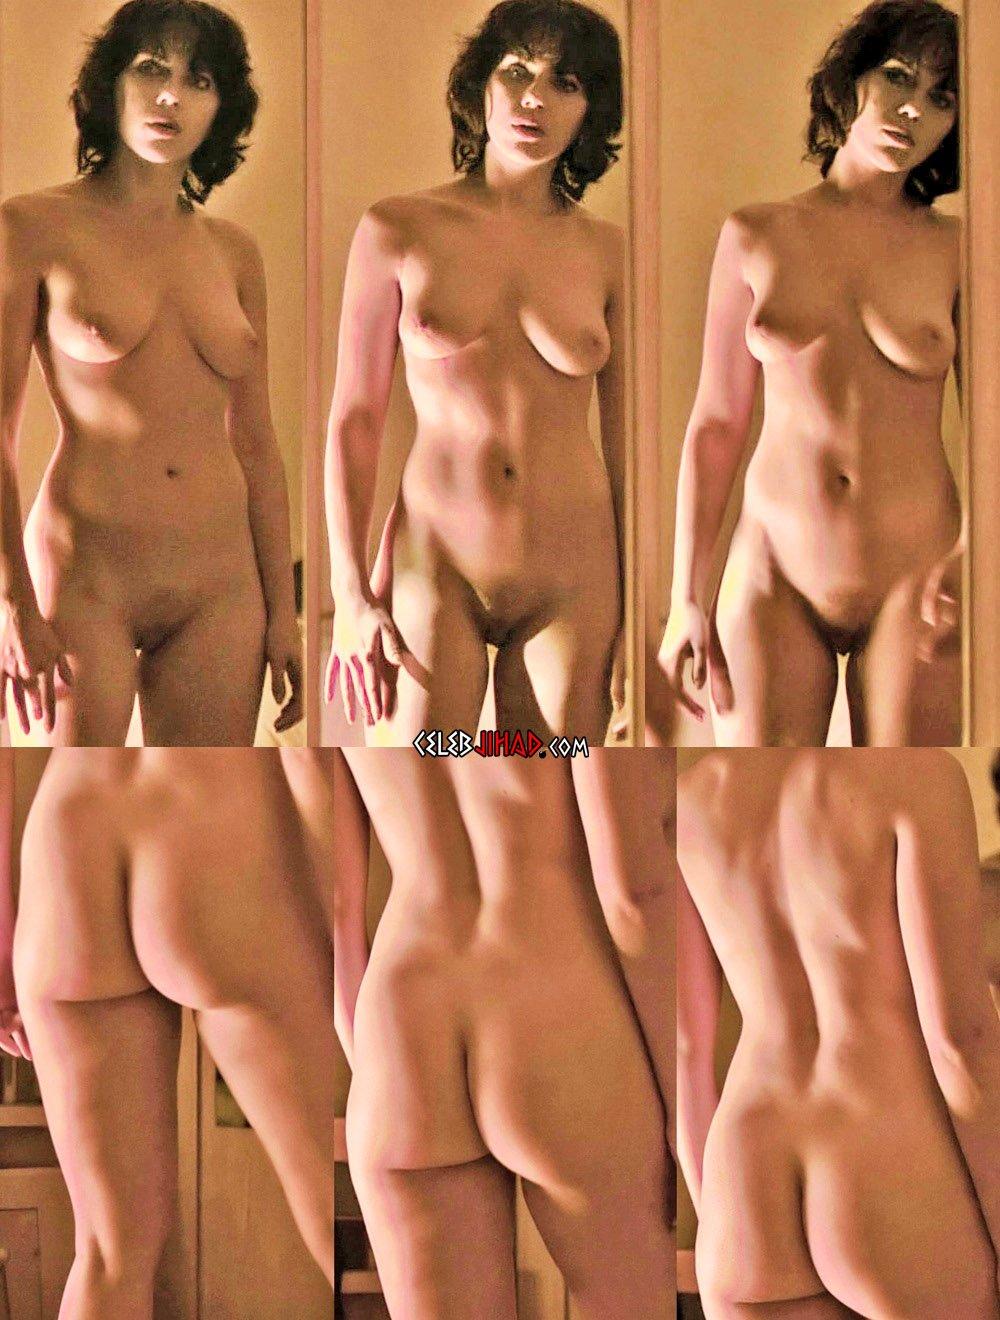 Scarlett Johansson Nude Scenes Color-Corrected And Enhanced Final Edit